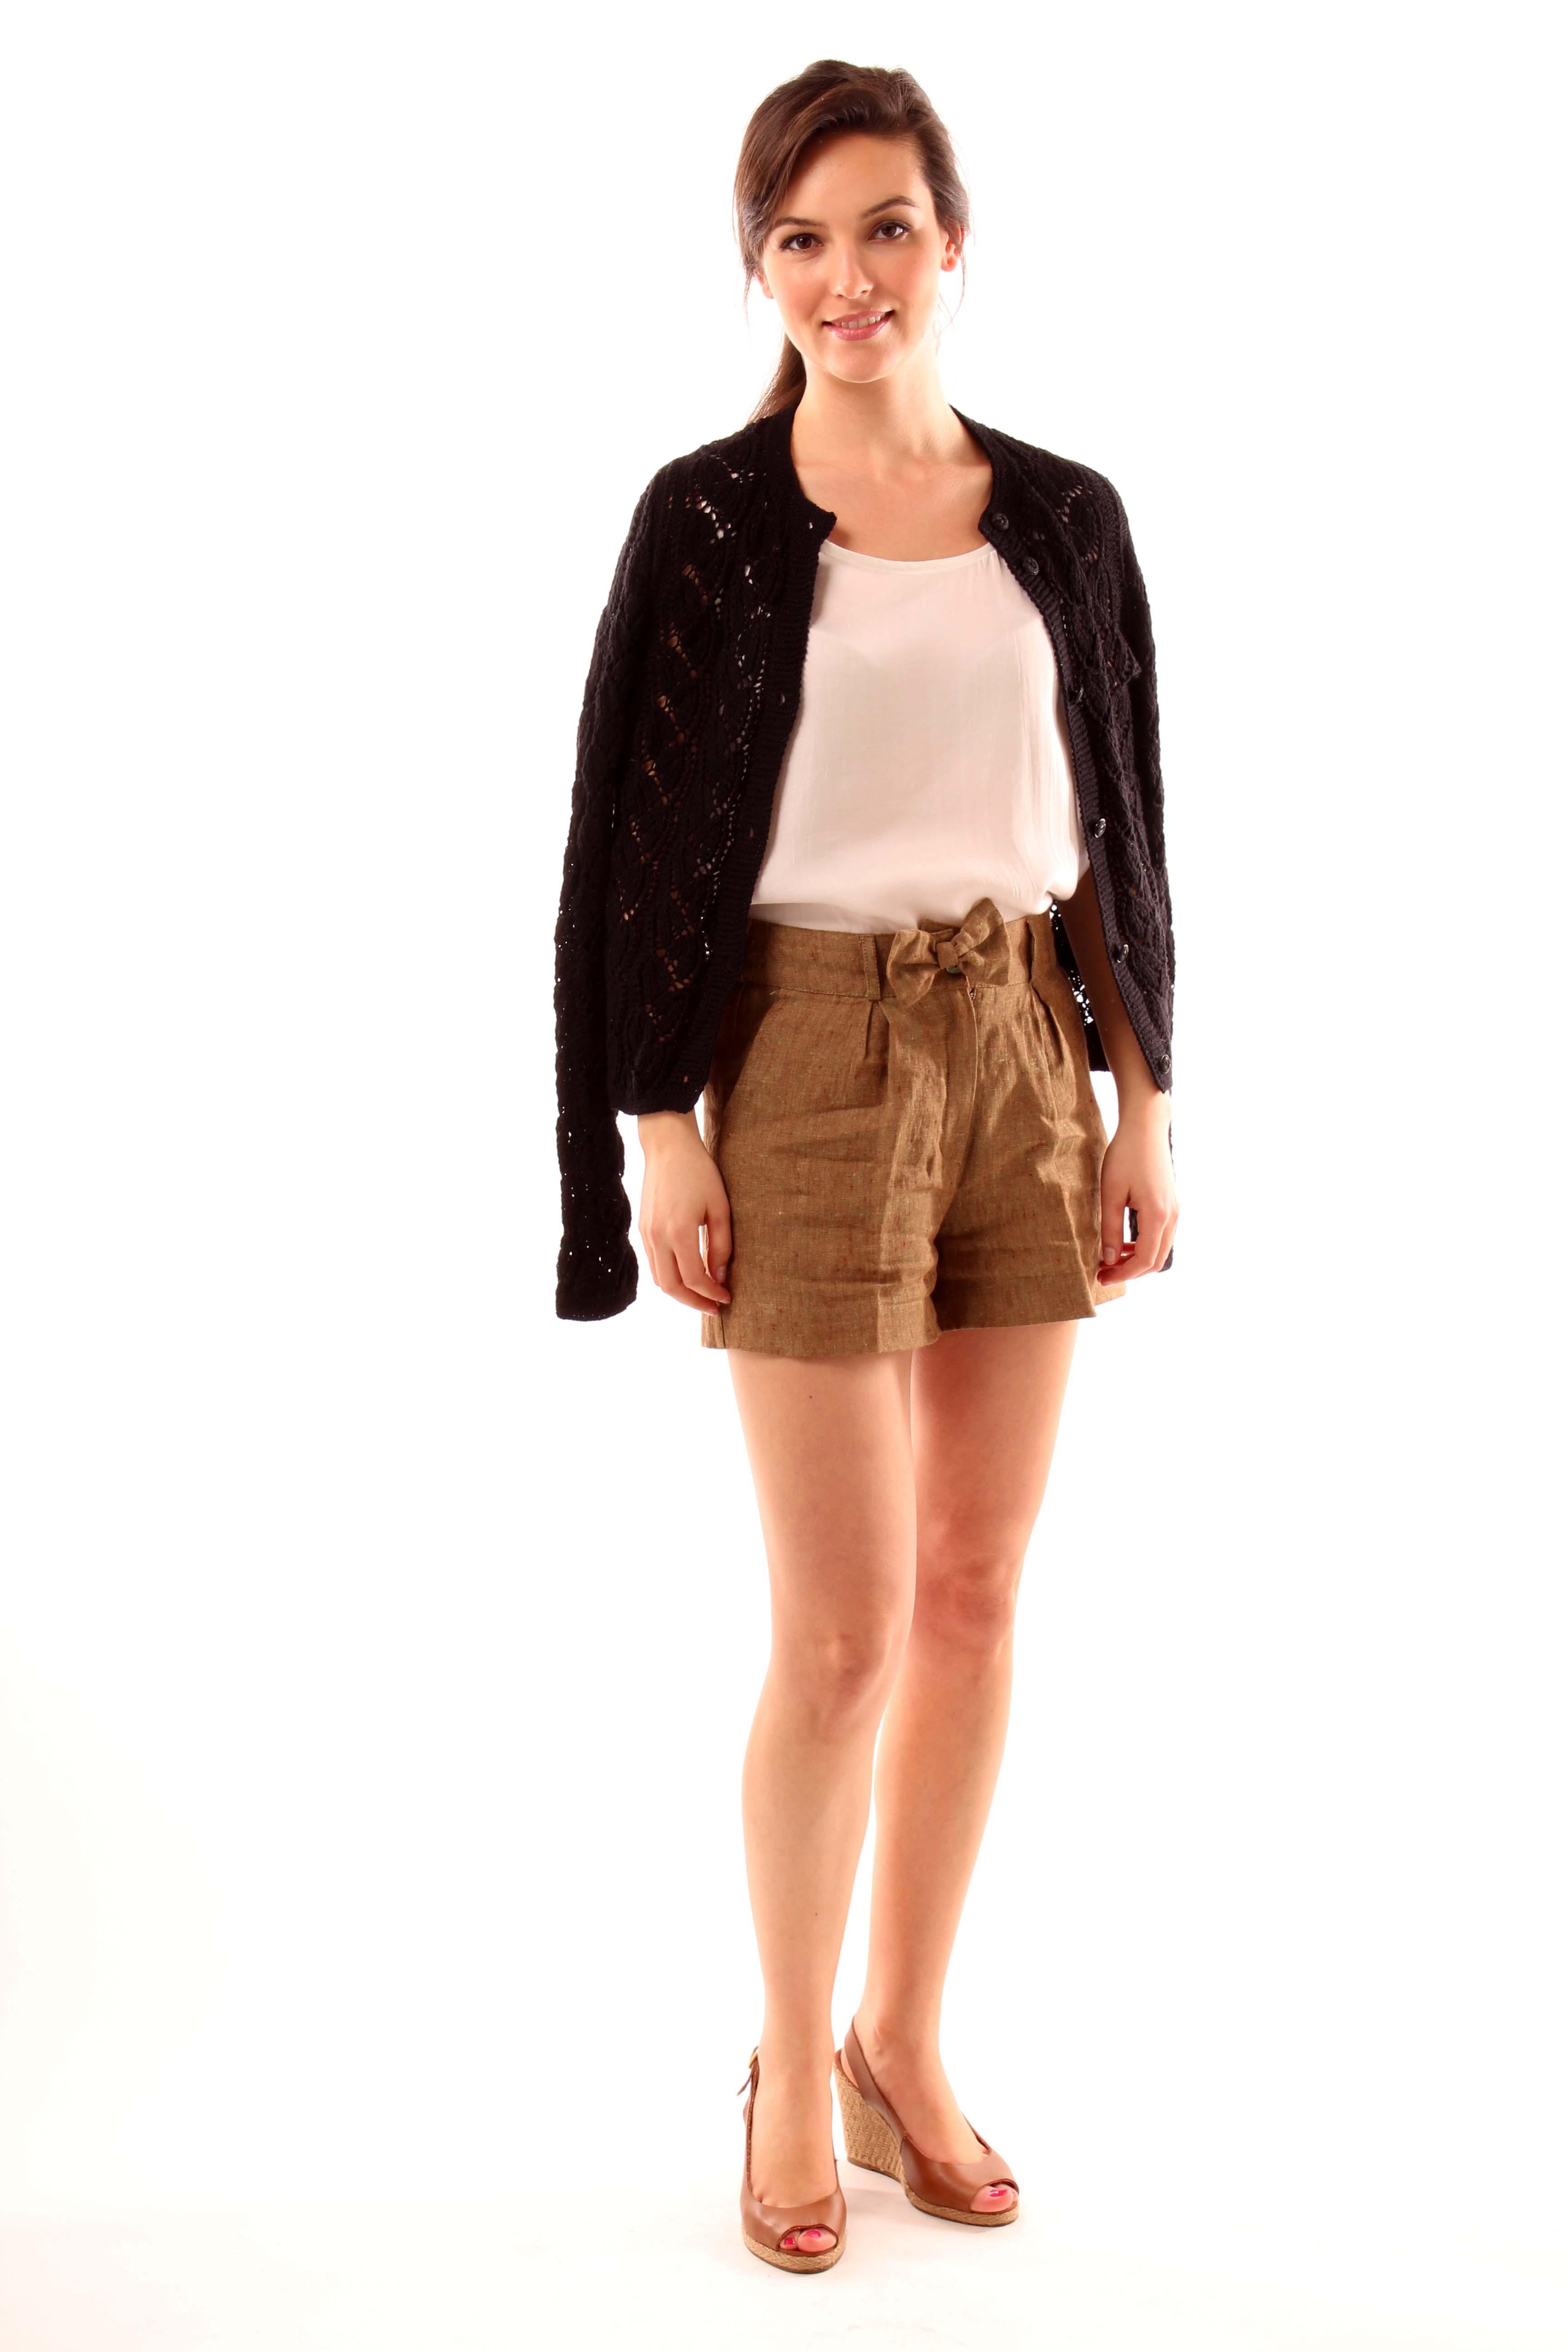 Linen dresses, beachwear and coverups